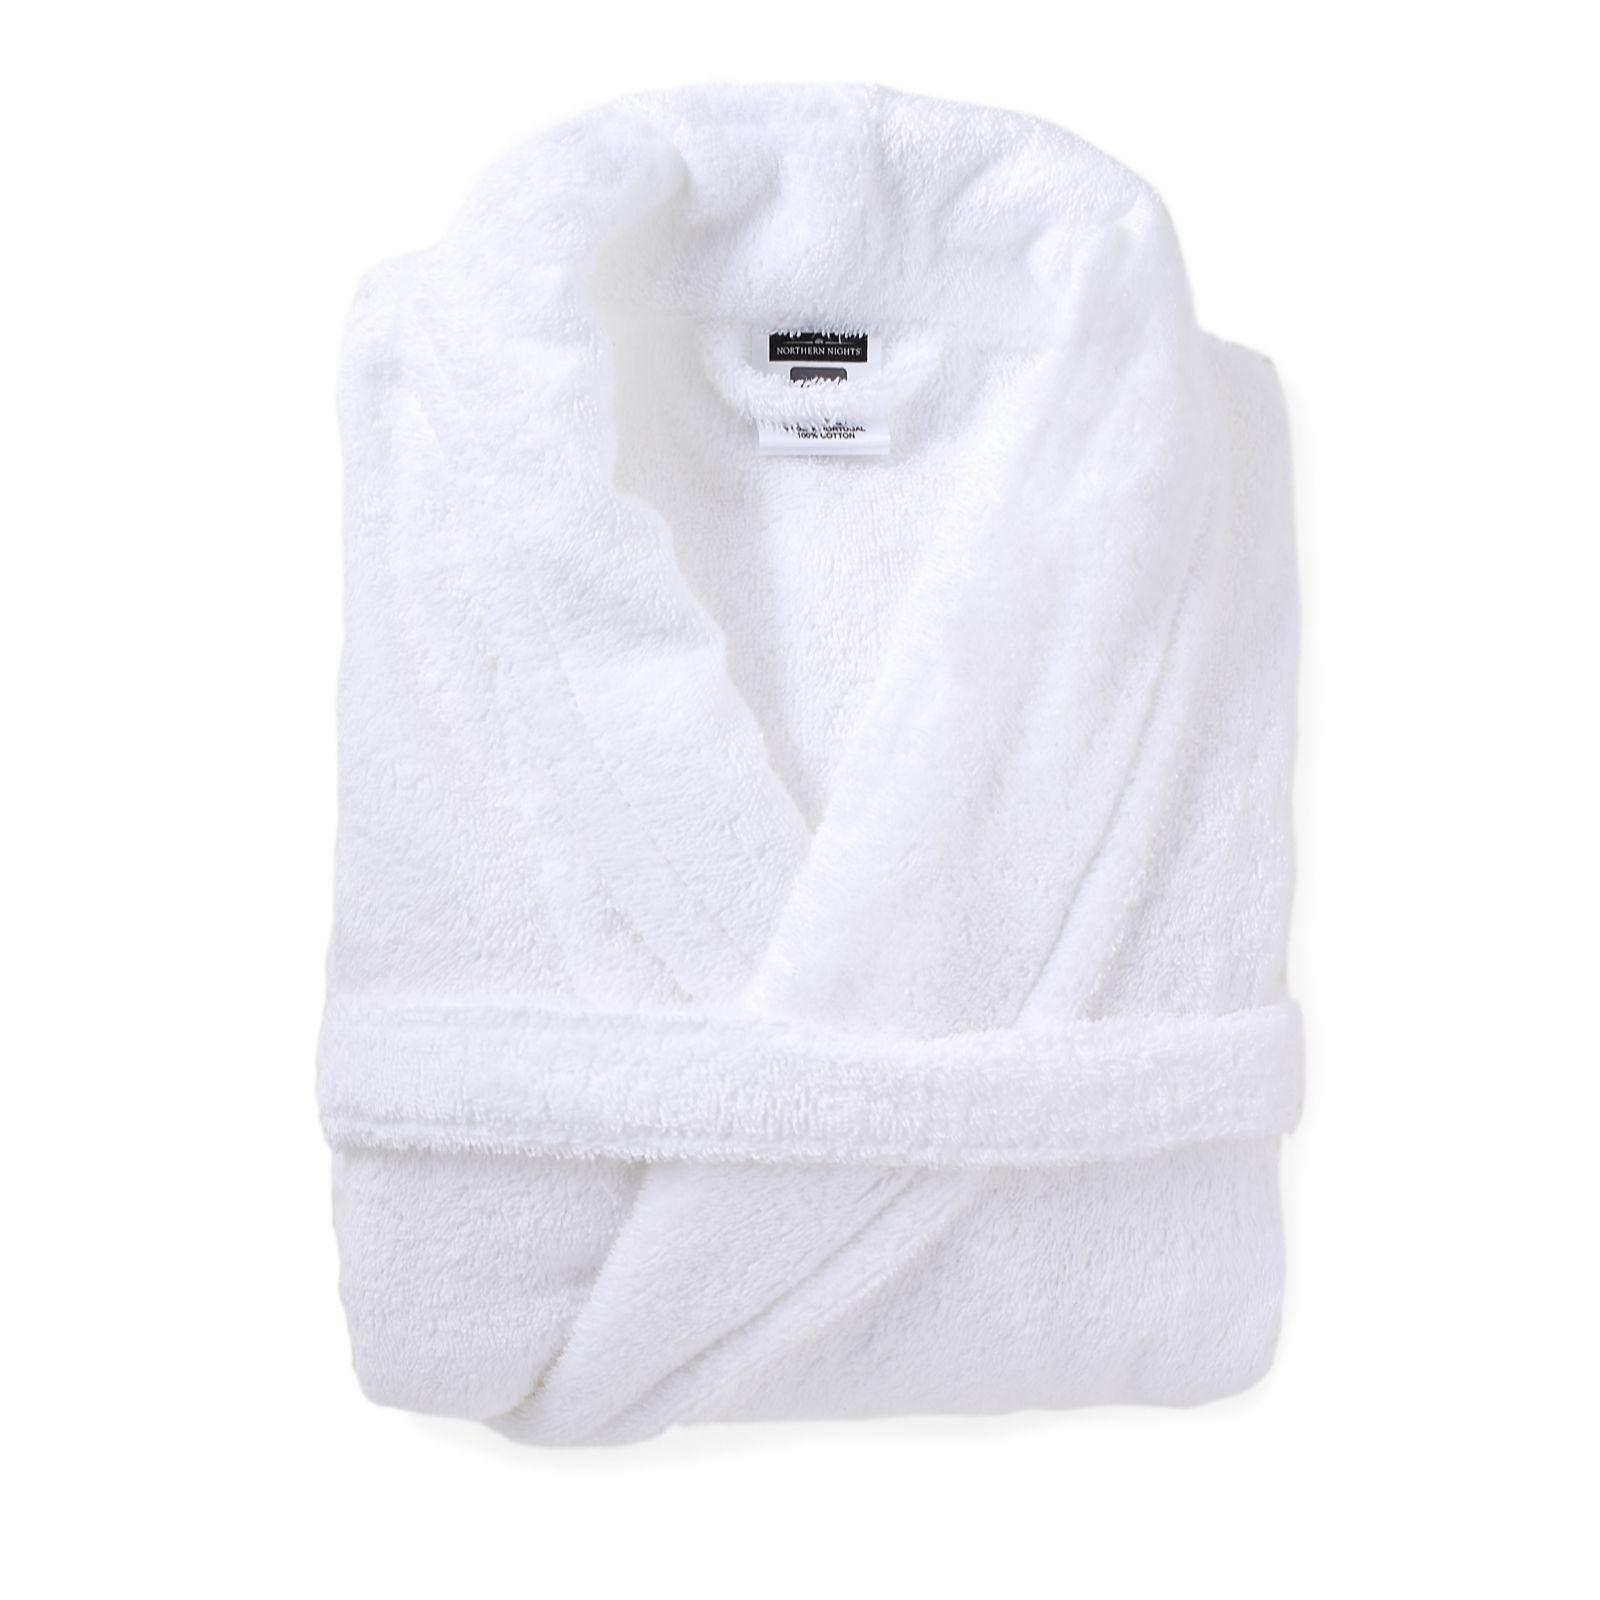 805230 Northern Nights 100% Cotton Air Drop Towelling Bath Robe ...